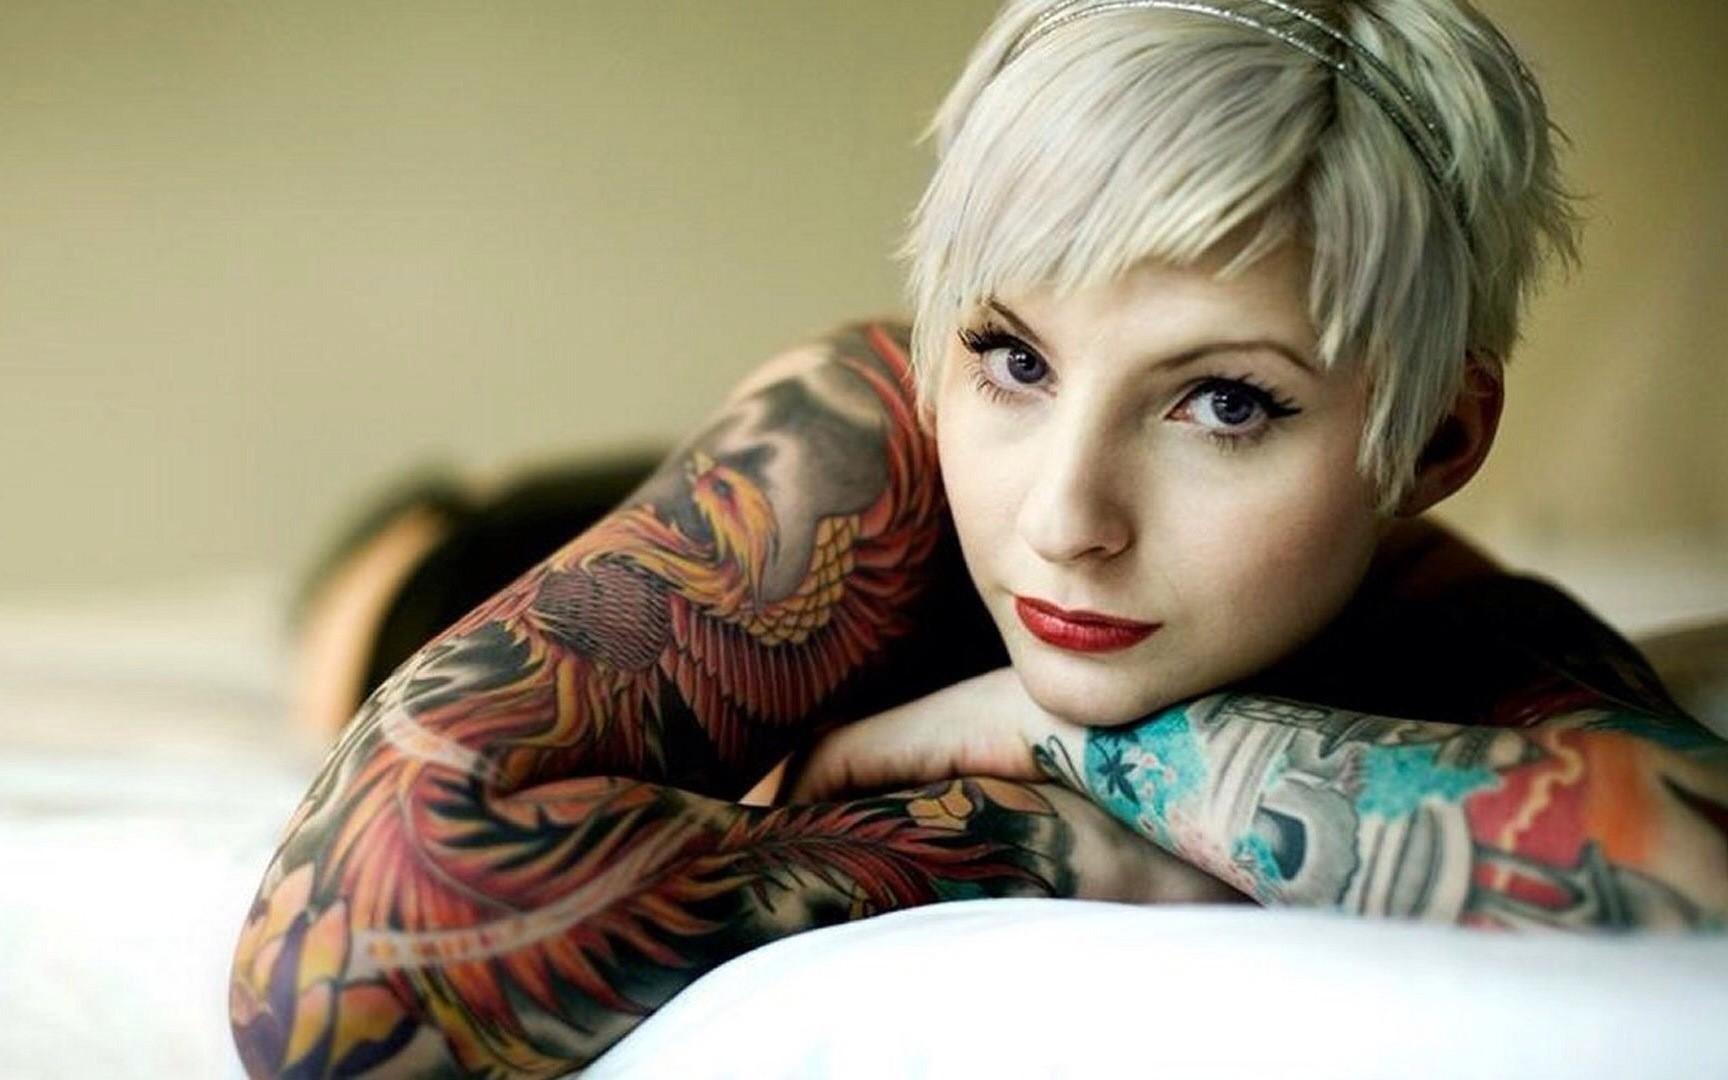 Tatuajes chicas brazos - 1728x1080